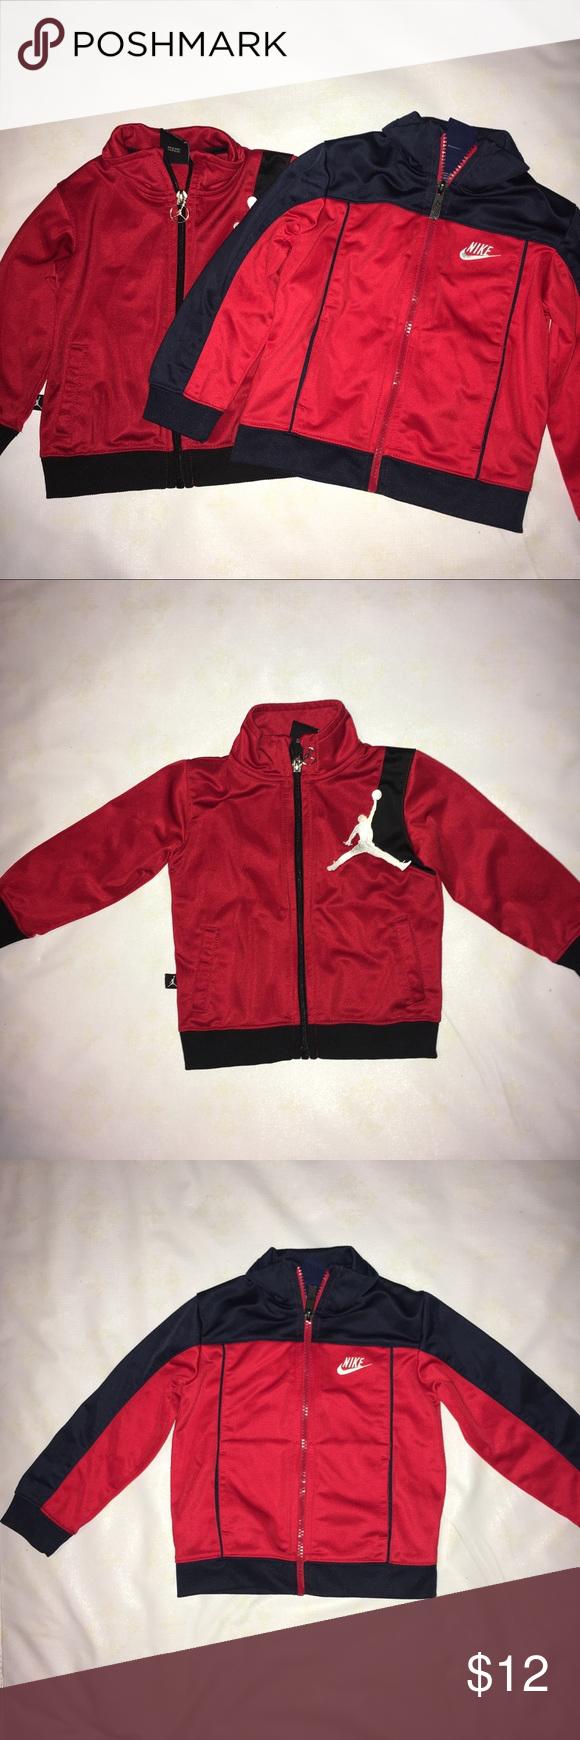 206b51f08bc56b Boy jackets •Red and black Jordan jacket •Red and blue Nike jacket •Worn  multiple times •Good condition •Size Nike 24M •Size Jordan 18M Nike Jackets    Coats